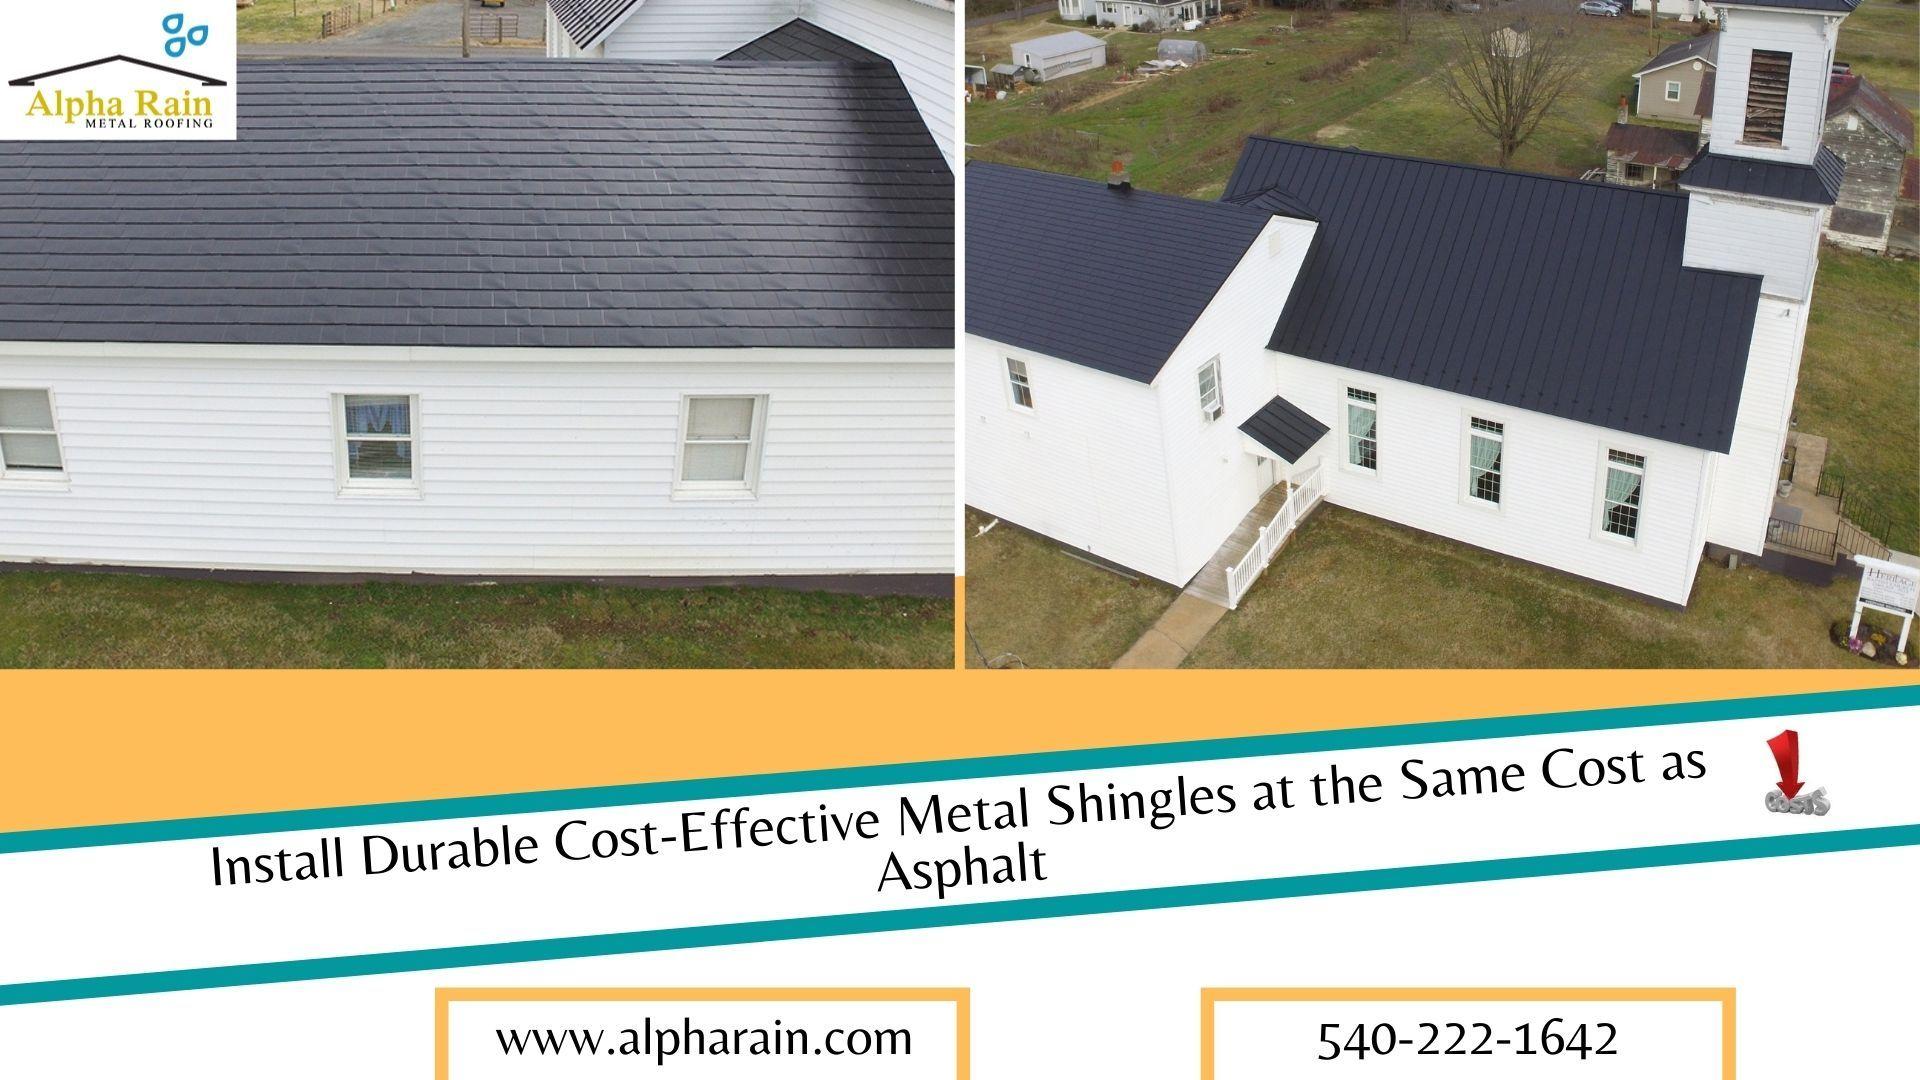 Metal Roof Shingles Permanent Roof Alpha Rain In 2020 Metal Shingle Roof Roof Shingles Shingling